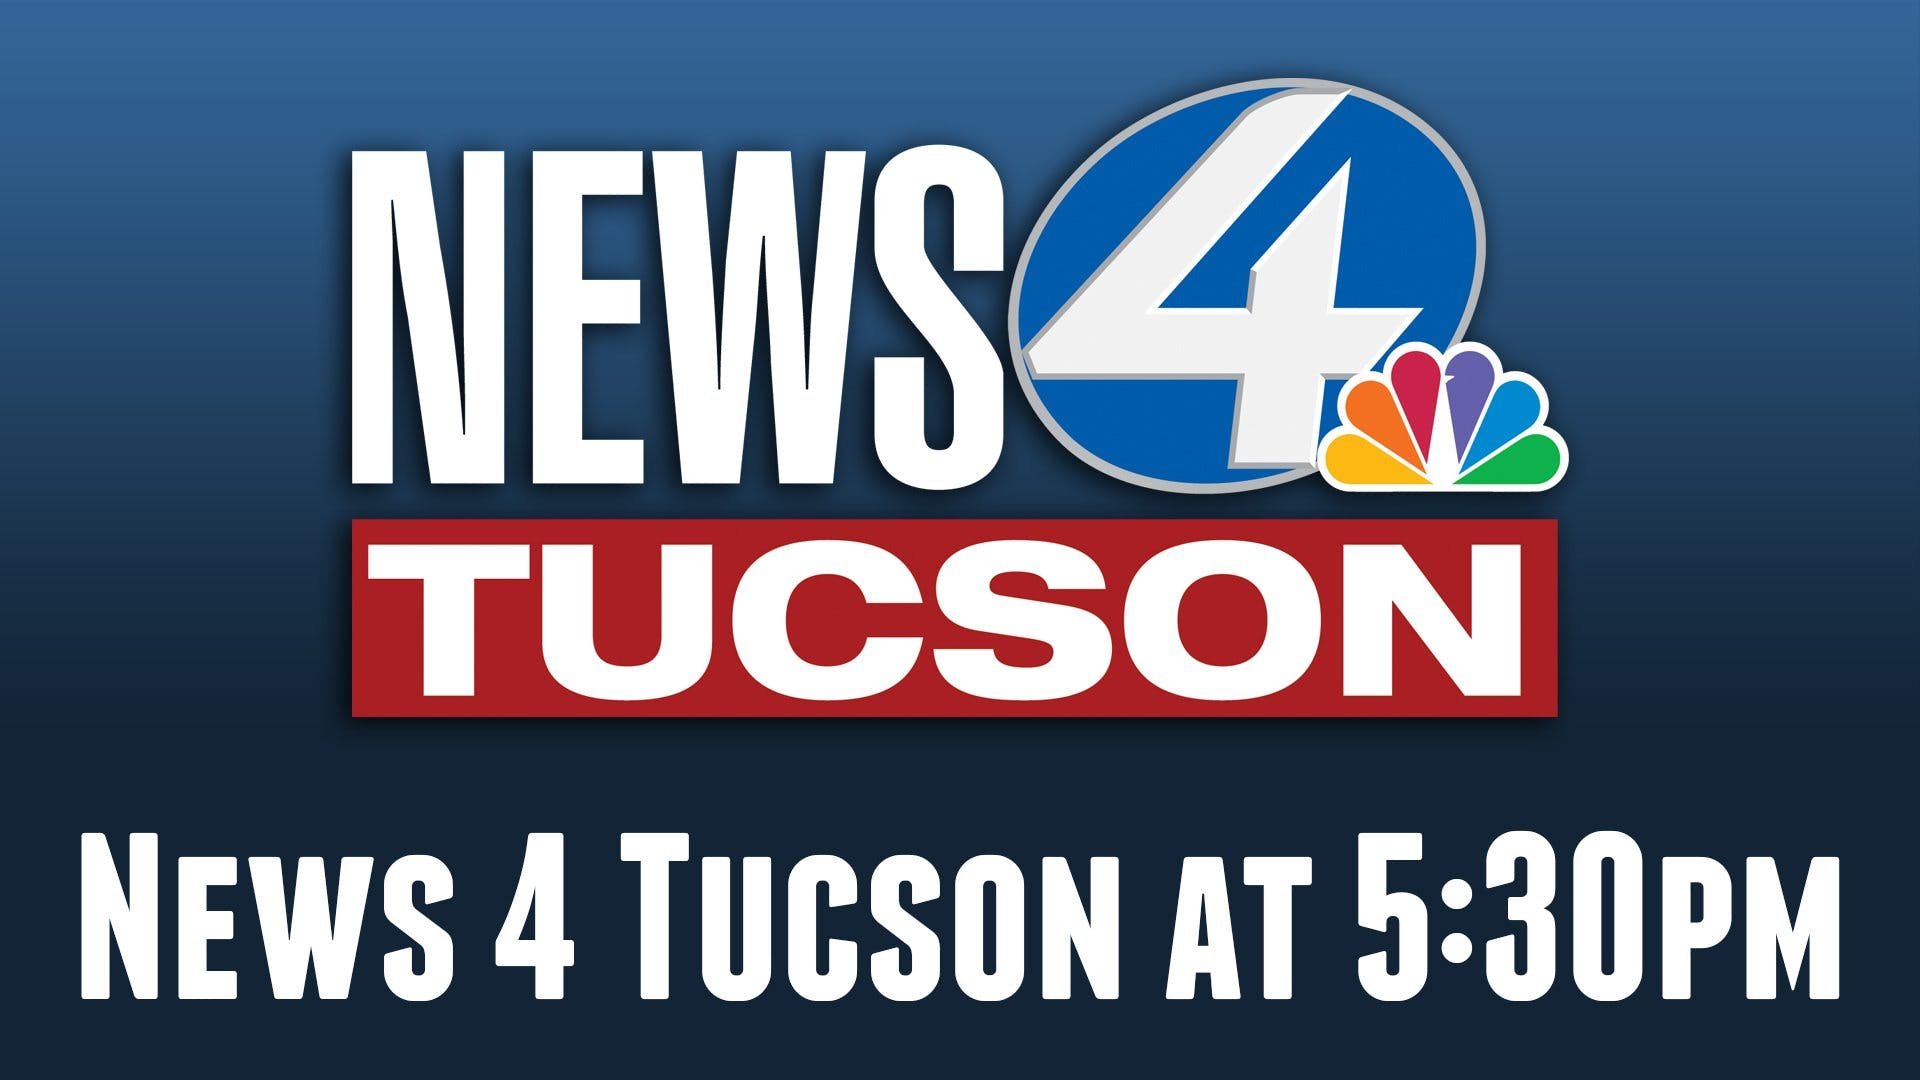 News 4 Tucson >> Watch News 4 Tucson At 5 30pm Stream On Fubotv Free Trial